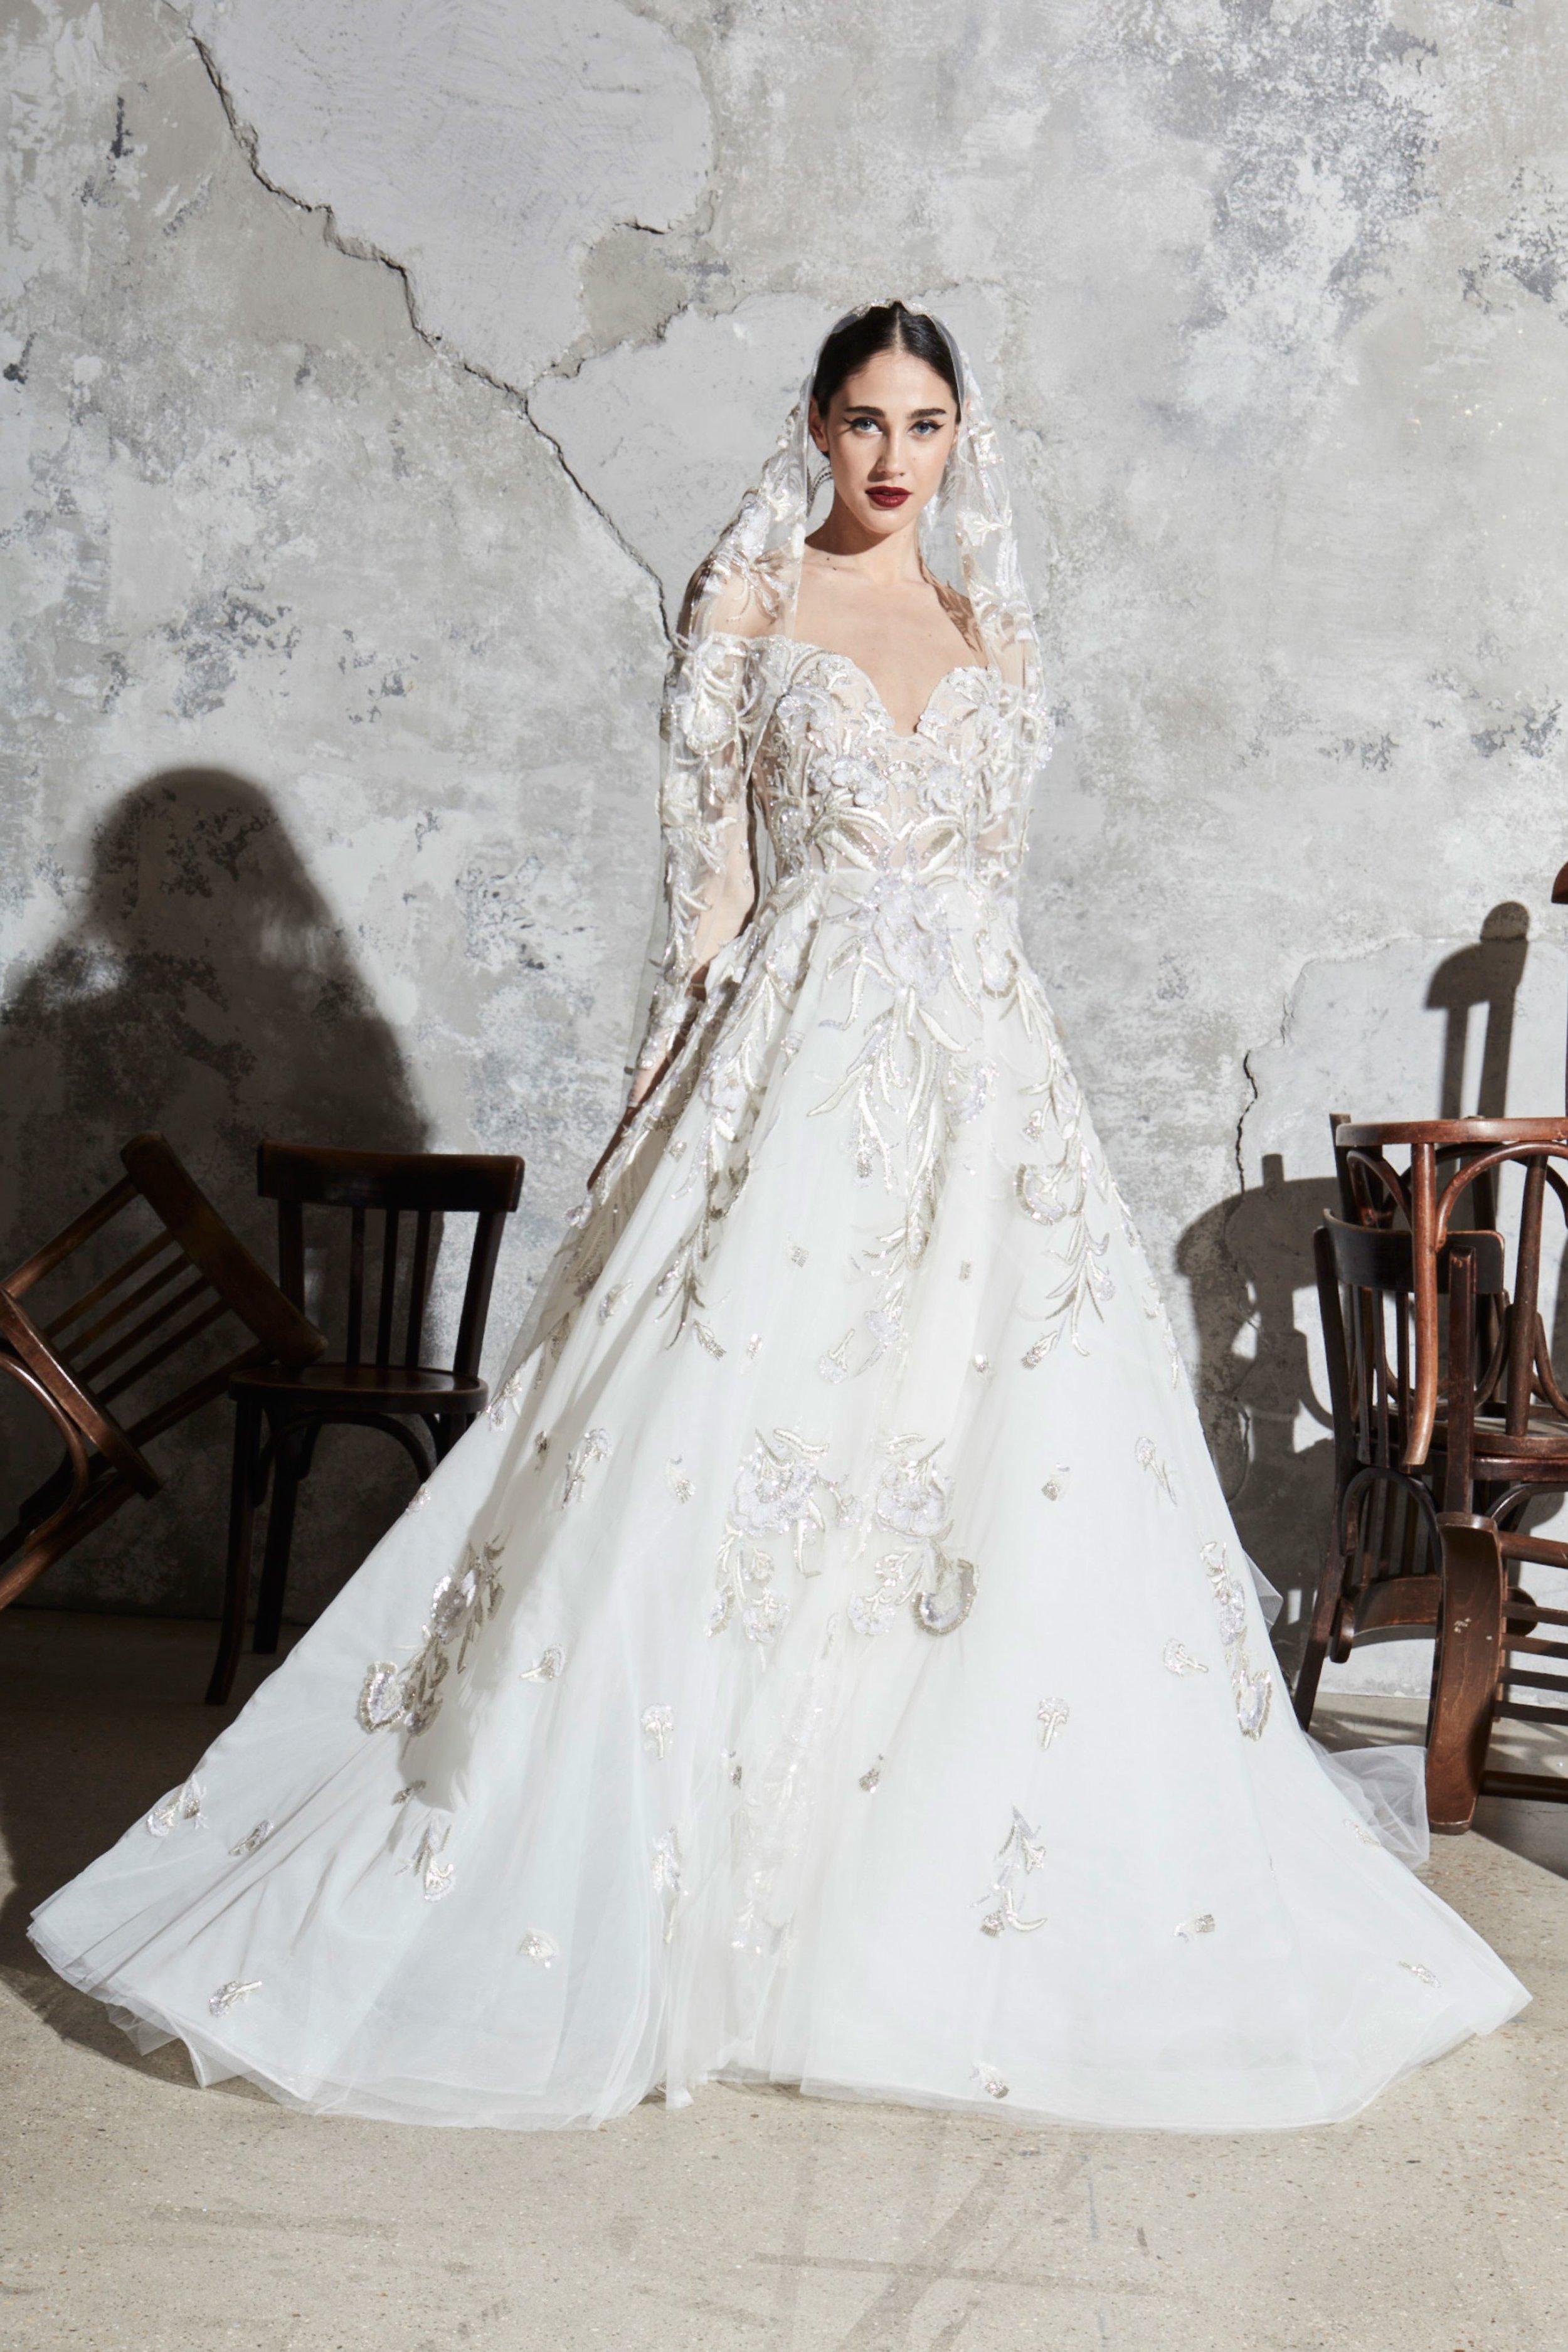 00025-zuhair-murad-new-york-bridal-Spring-2020-CREDIT-Thomas-Nutzl.jpg